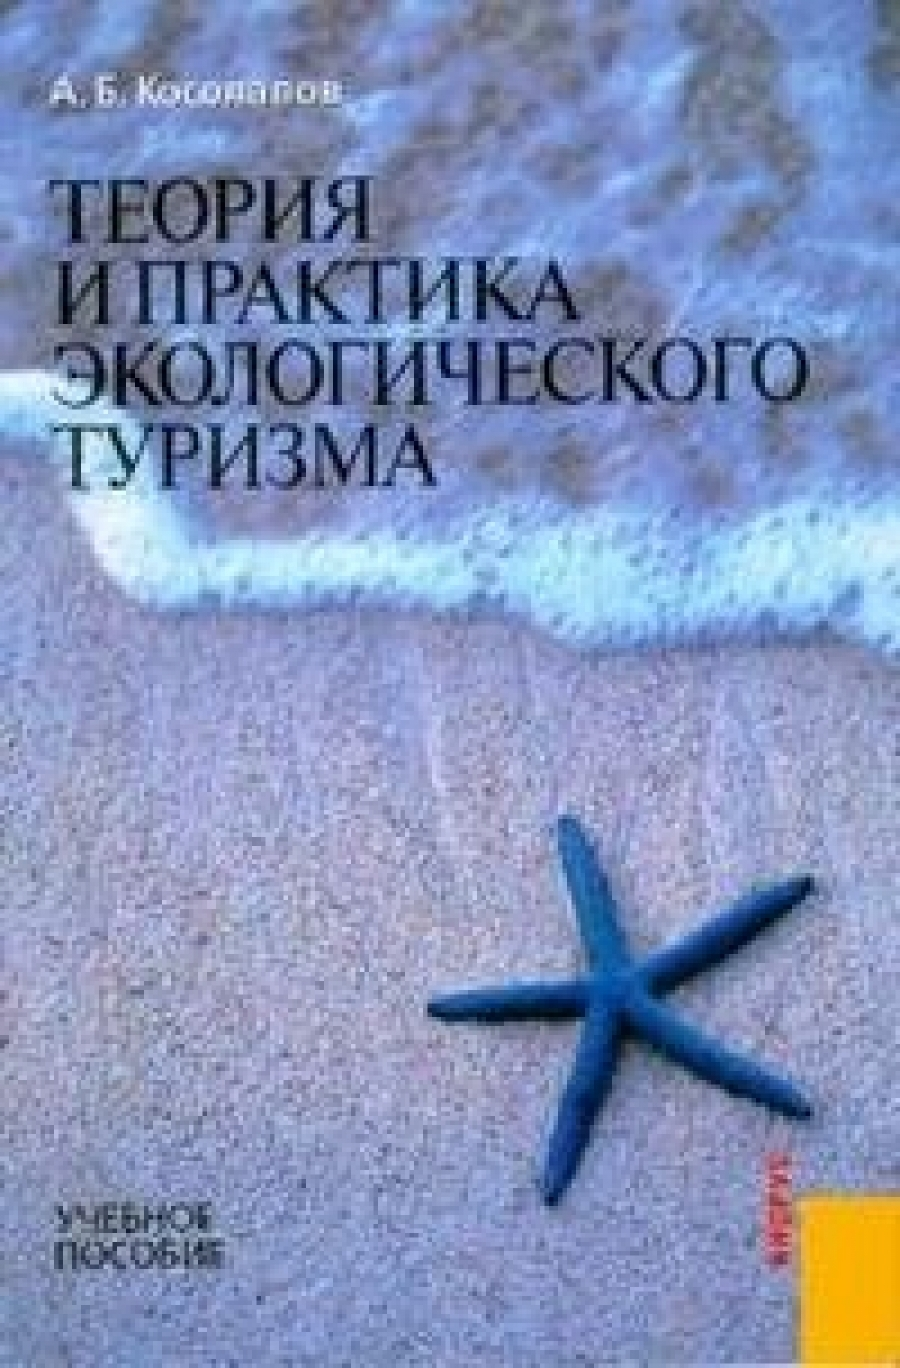 Обложка книги:  косолапов а.б. - теория и практика экологического туризма.